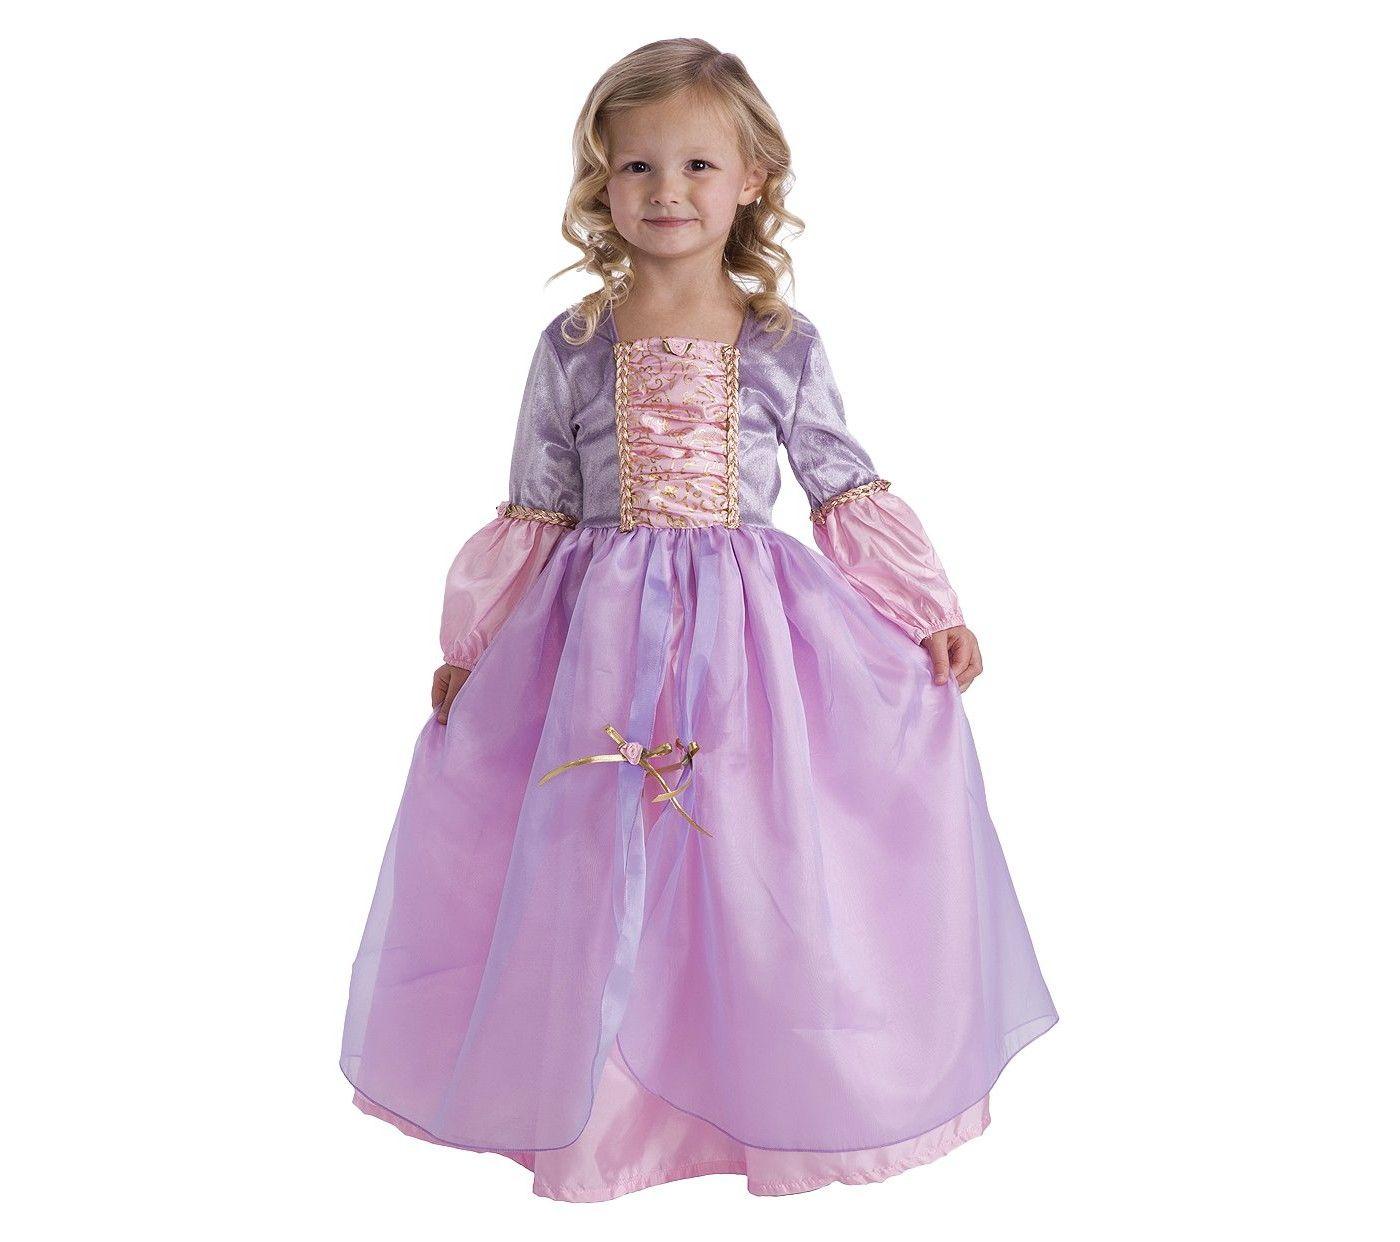 32+ Rapunzel wedding dress costume ideas in 2021